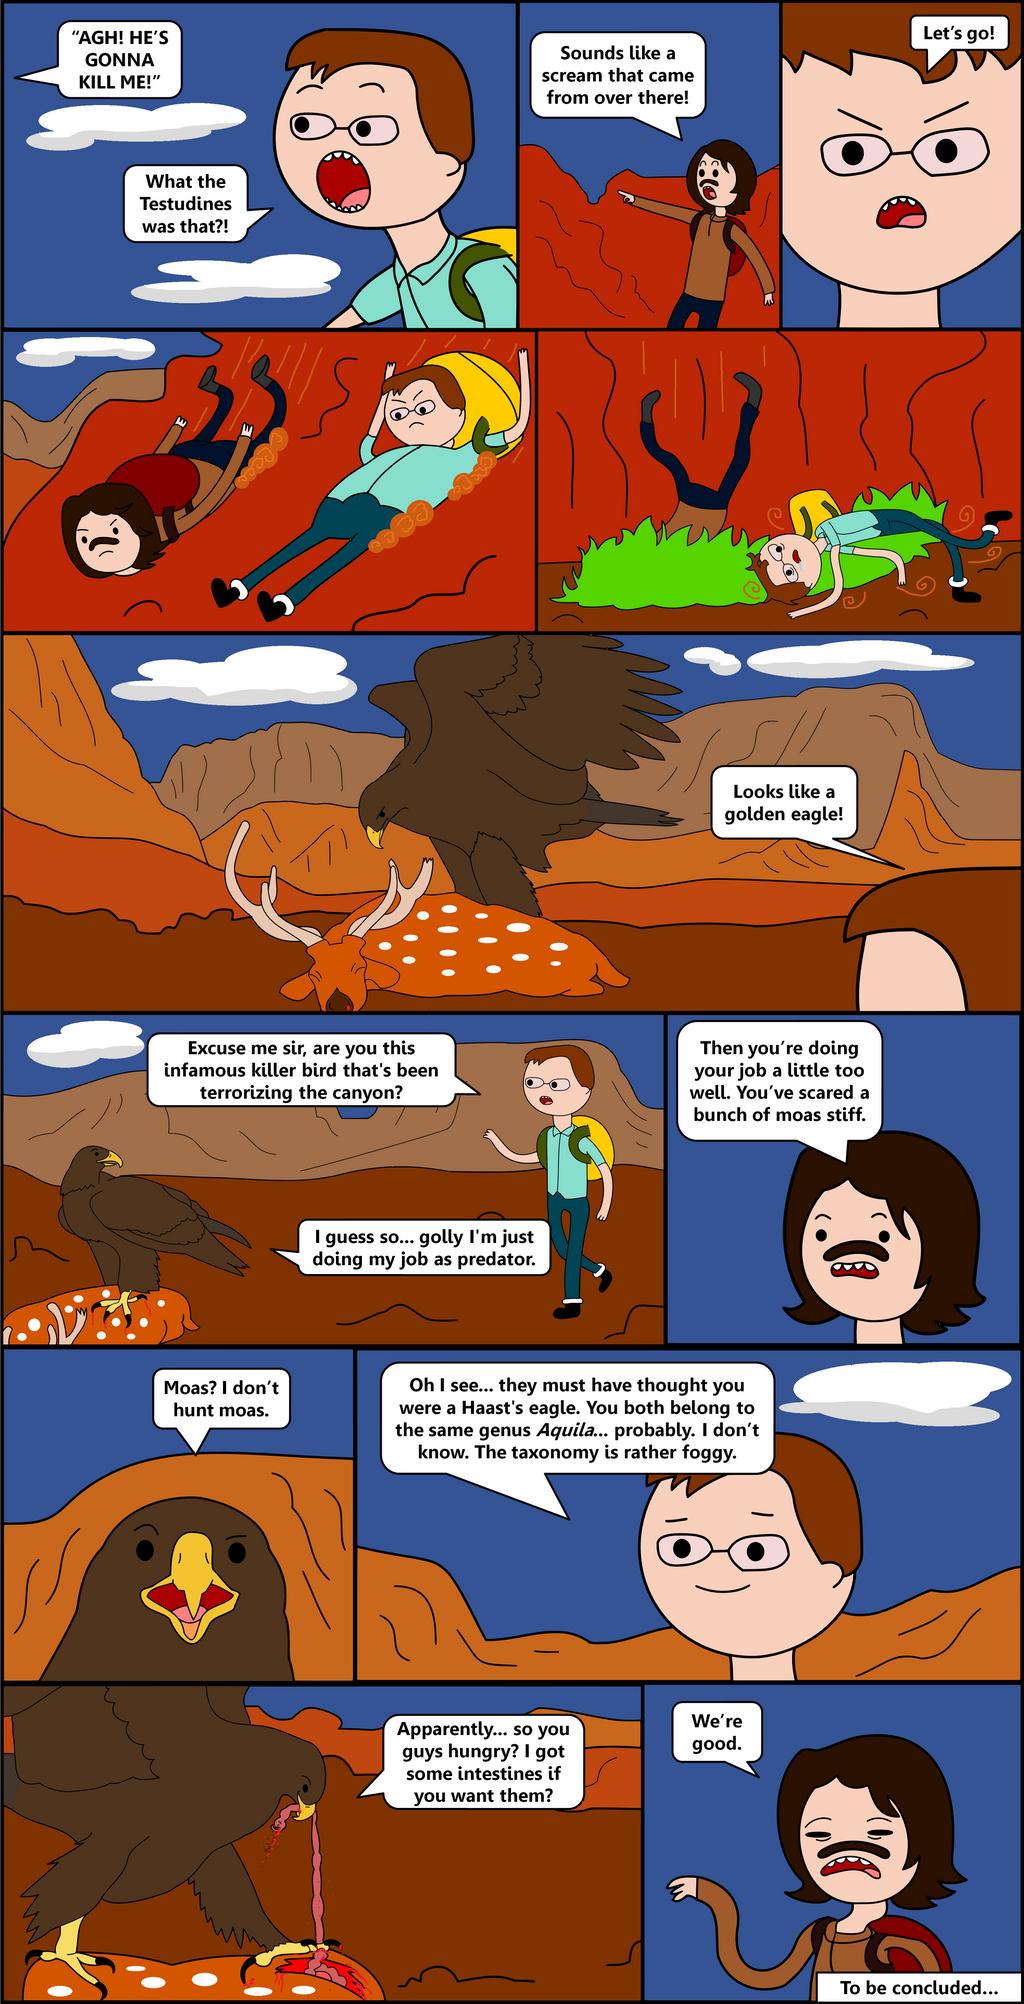 TetZoo Time! - Episode 1 (Comic 4/5) by classicalguy